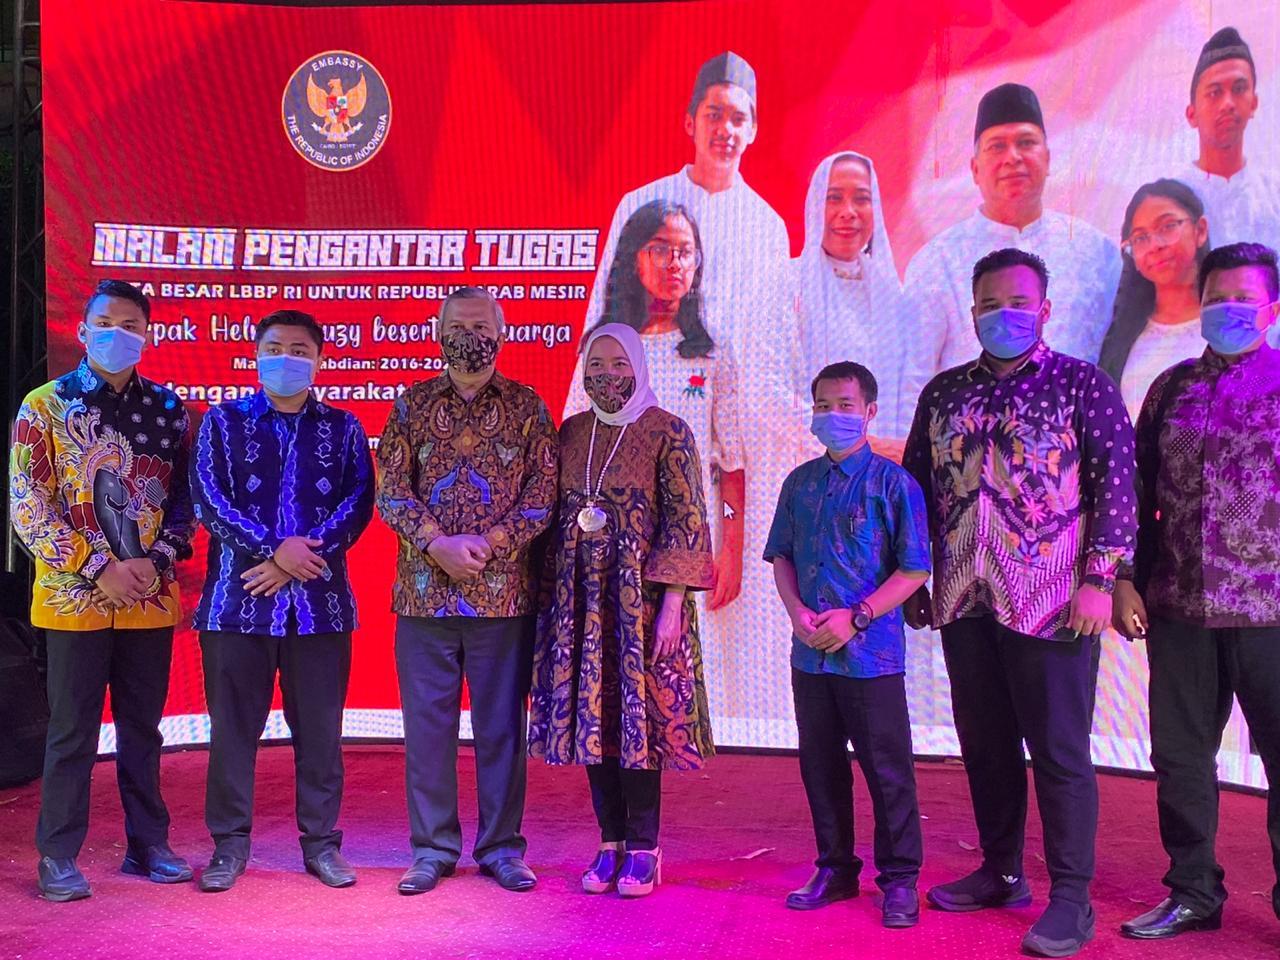 Pesan Dubes di Malam Pengantar Tugas: Masa Depan Indonesia di Tangan Anda